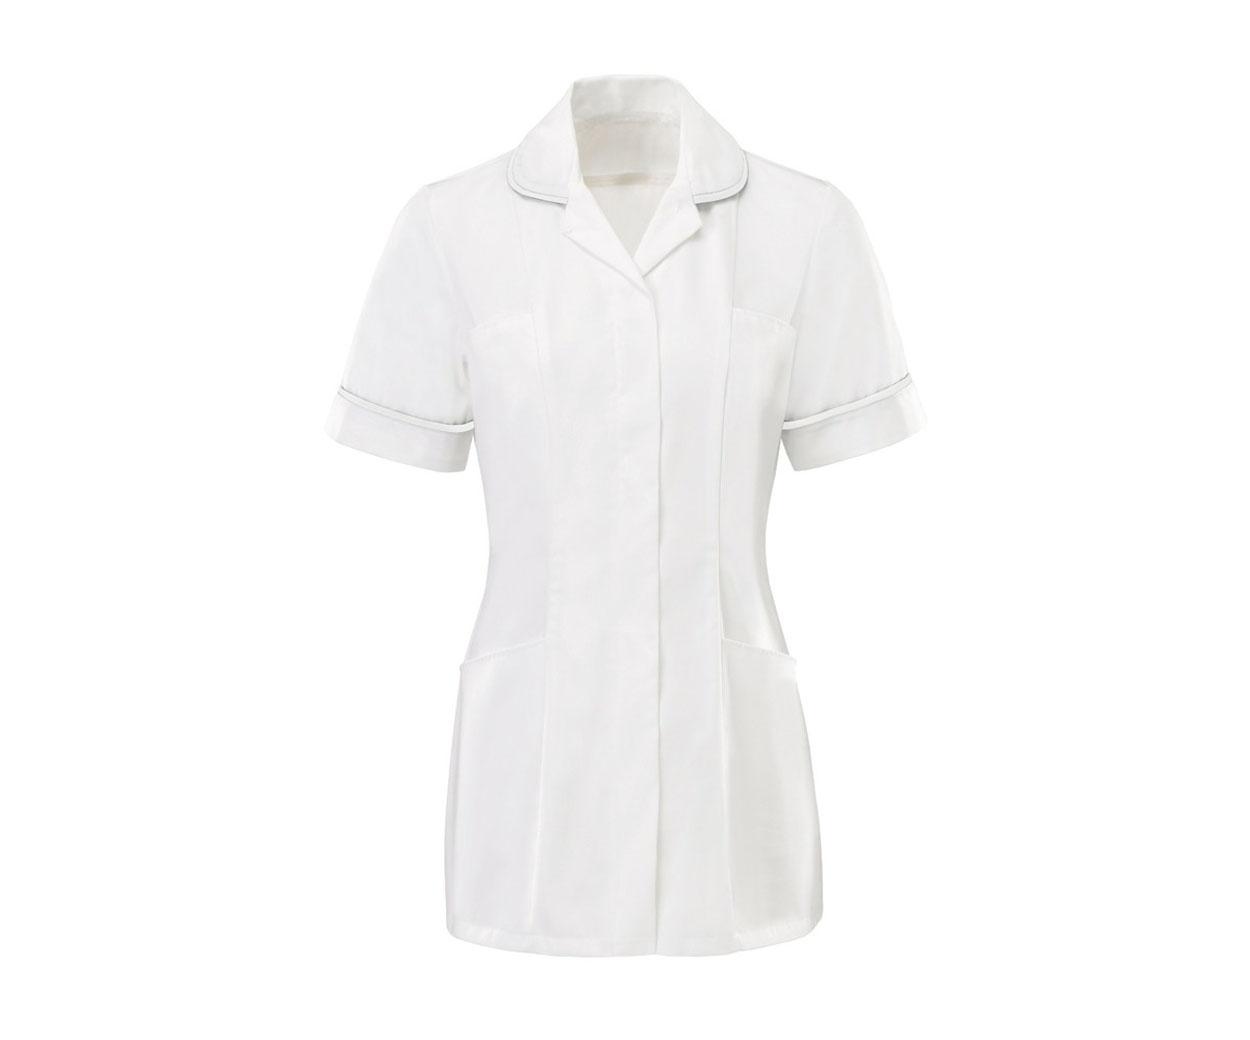 White zip fastening ladies tunic with white piping